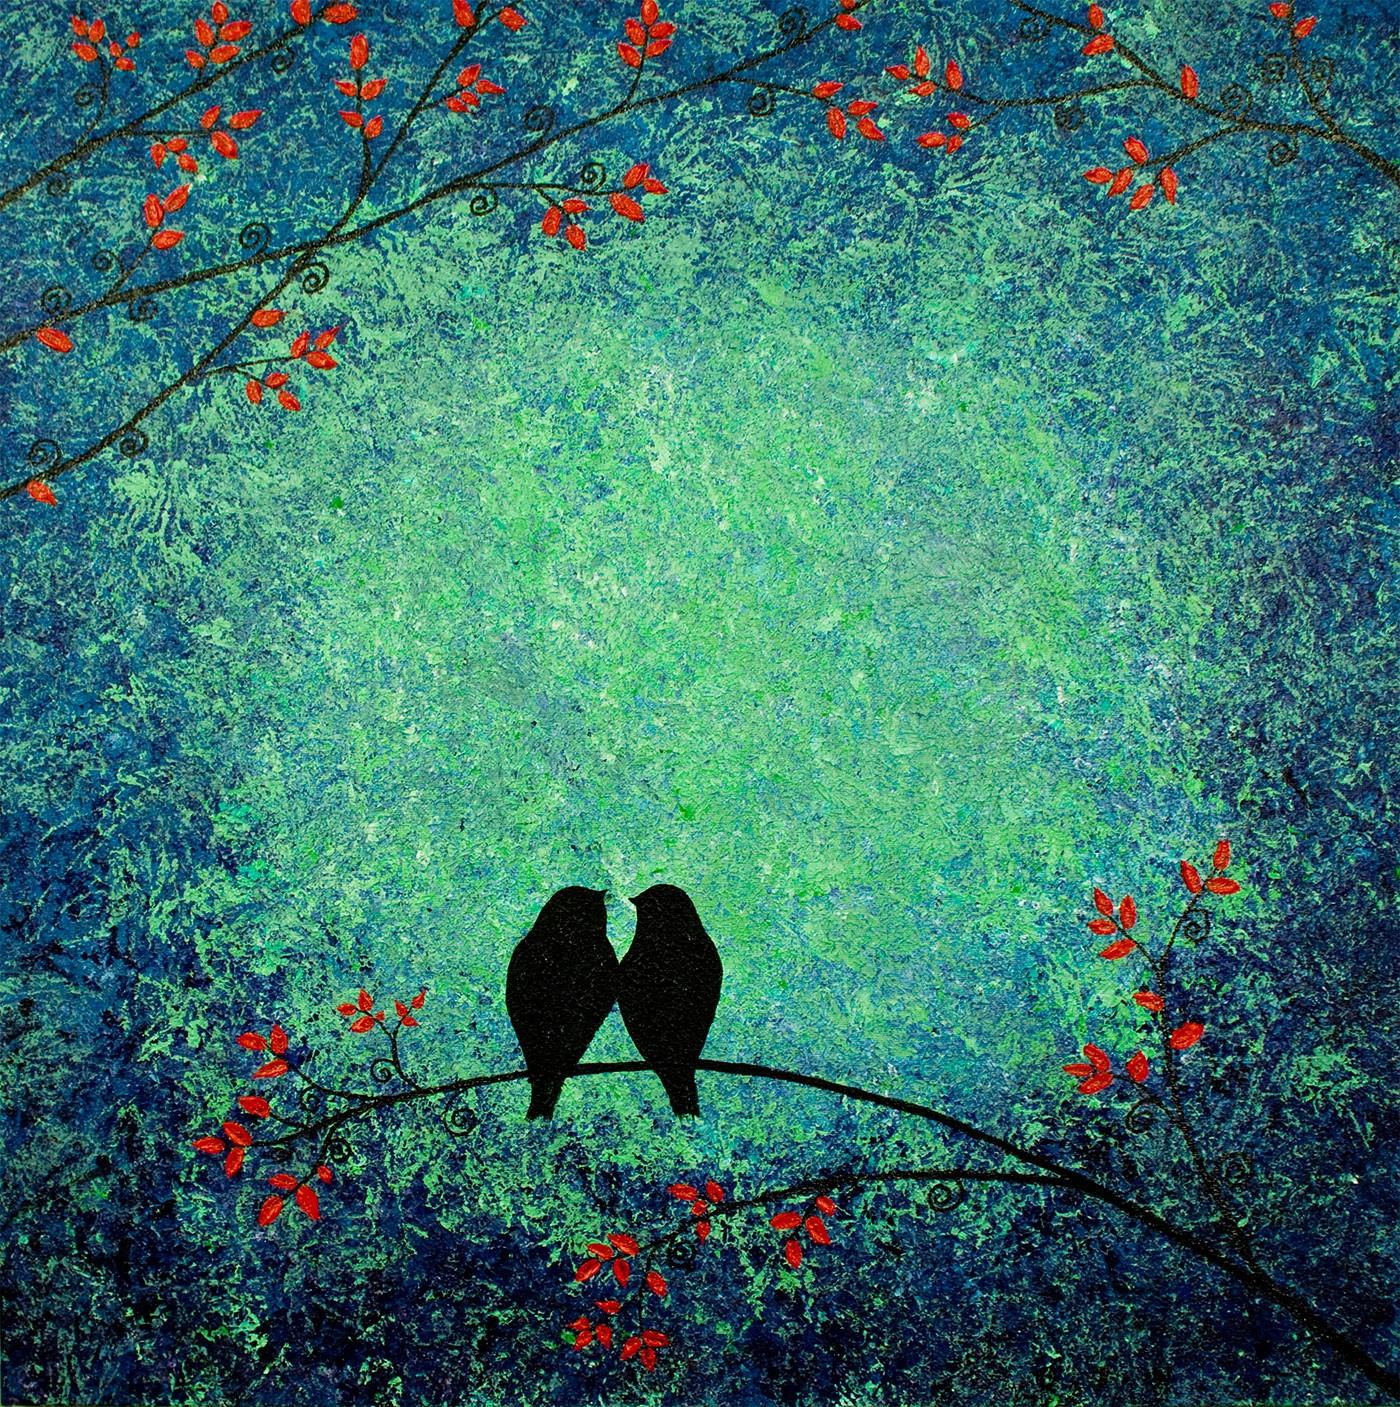 Lovebirds in Bloom